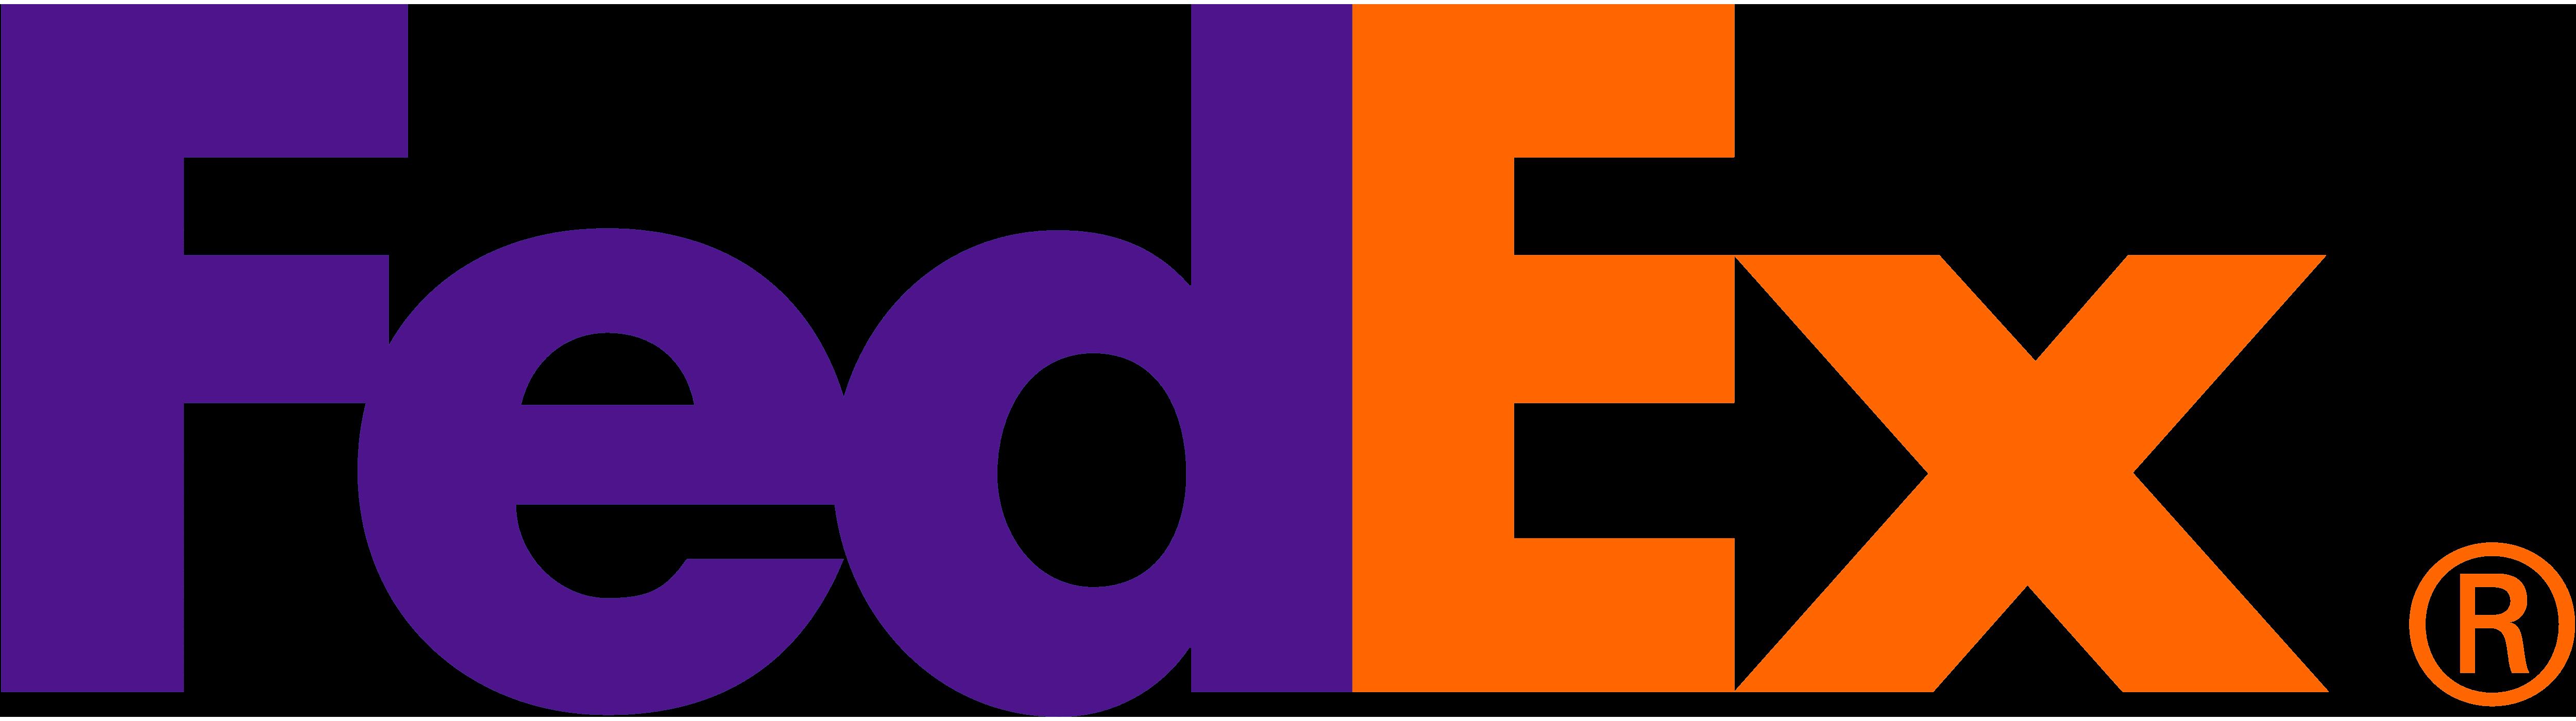 fedex_logo_orange-purple